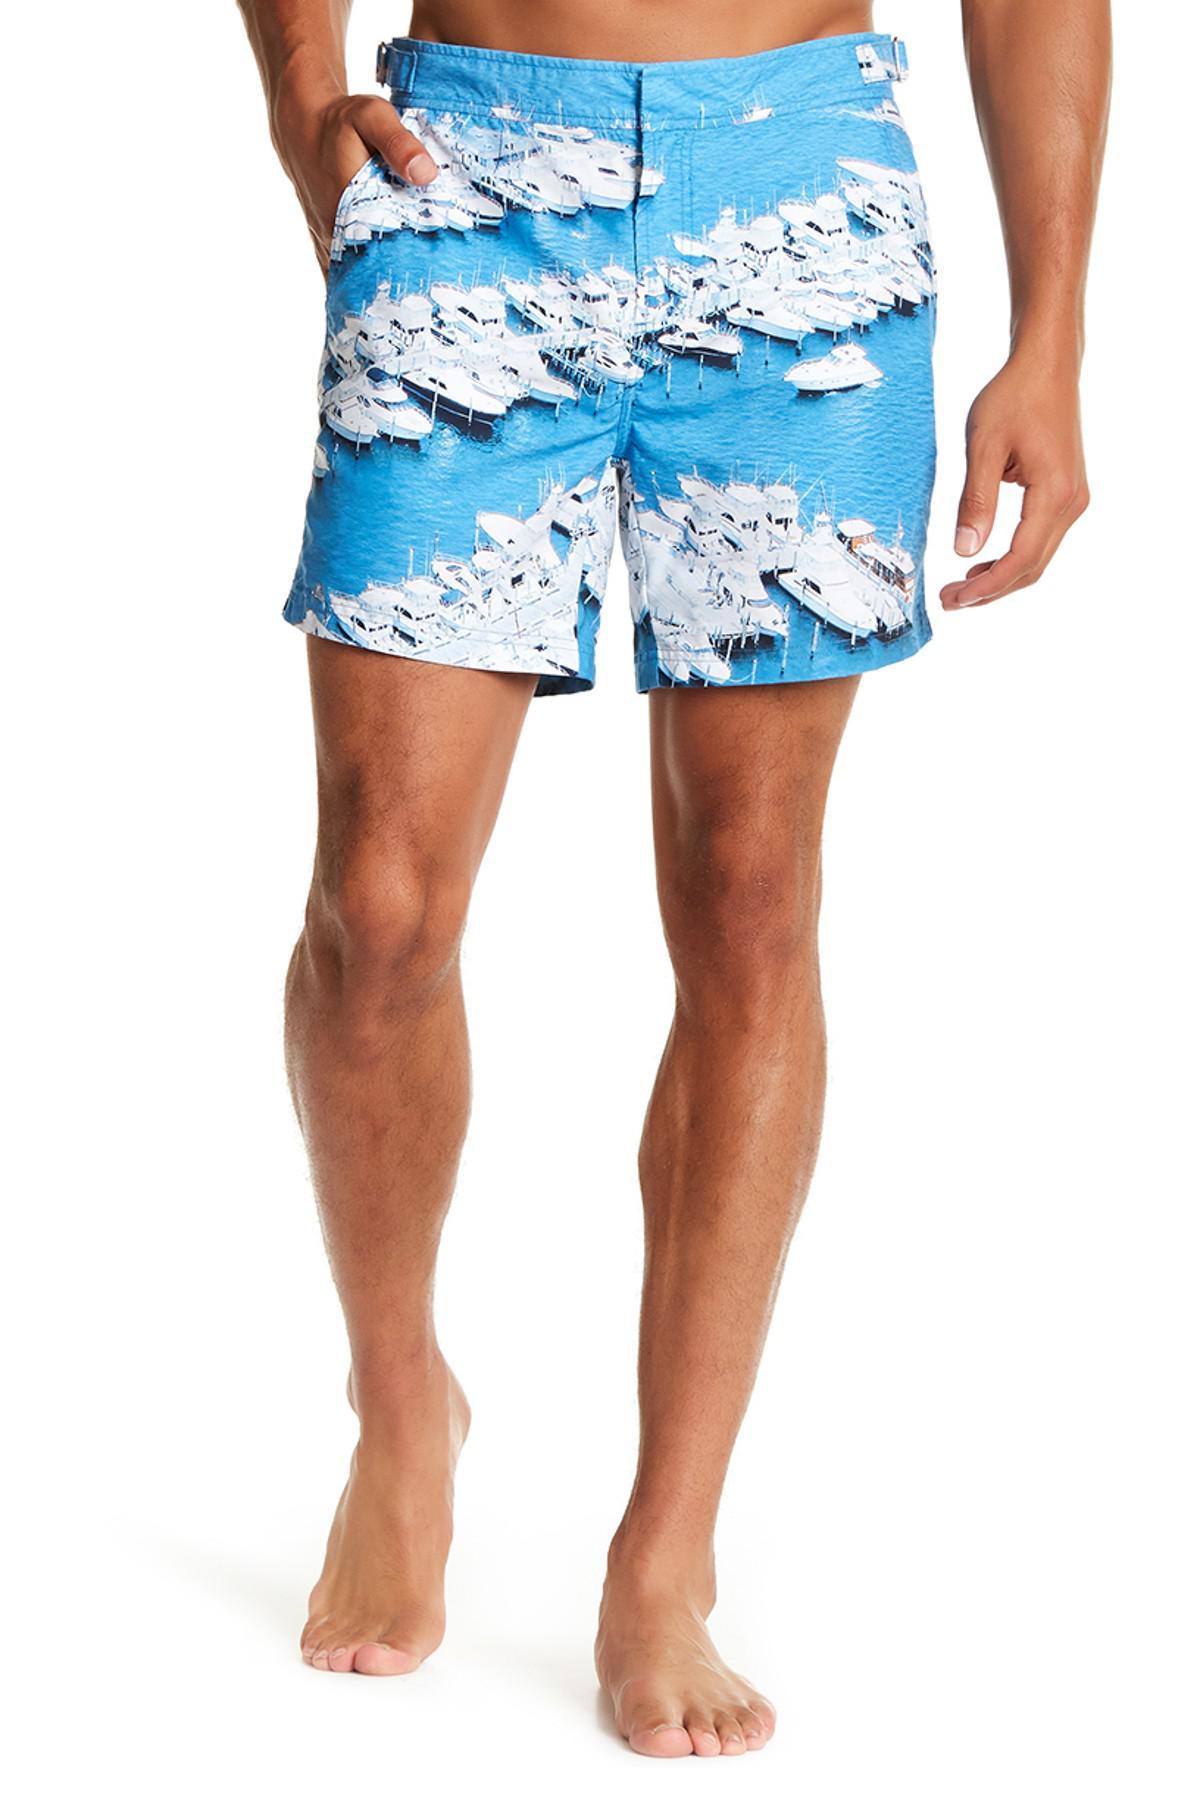 b8b1dcb3633cb Lyst - Jachs Harbor Print Hampton Fit Swim Trunk in Blue for Men